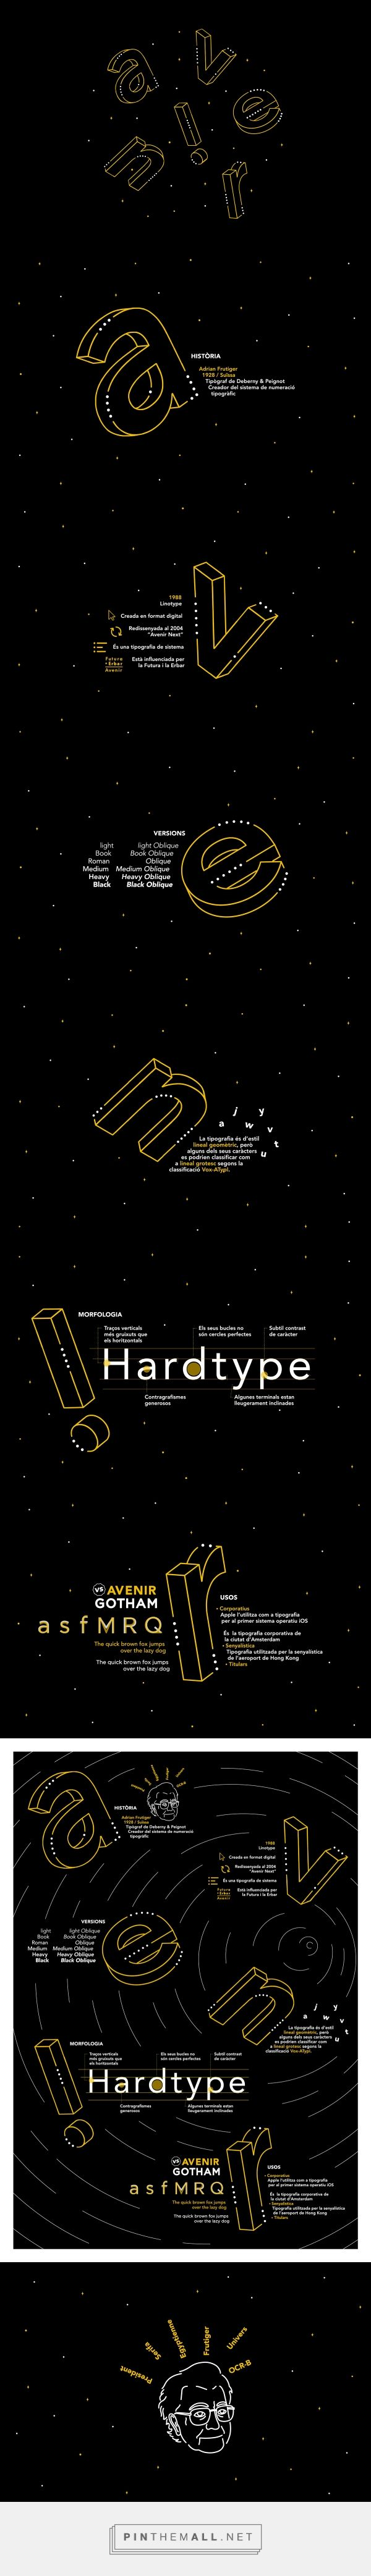 Avenir infographic by Dani Cirac Corbi